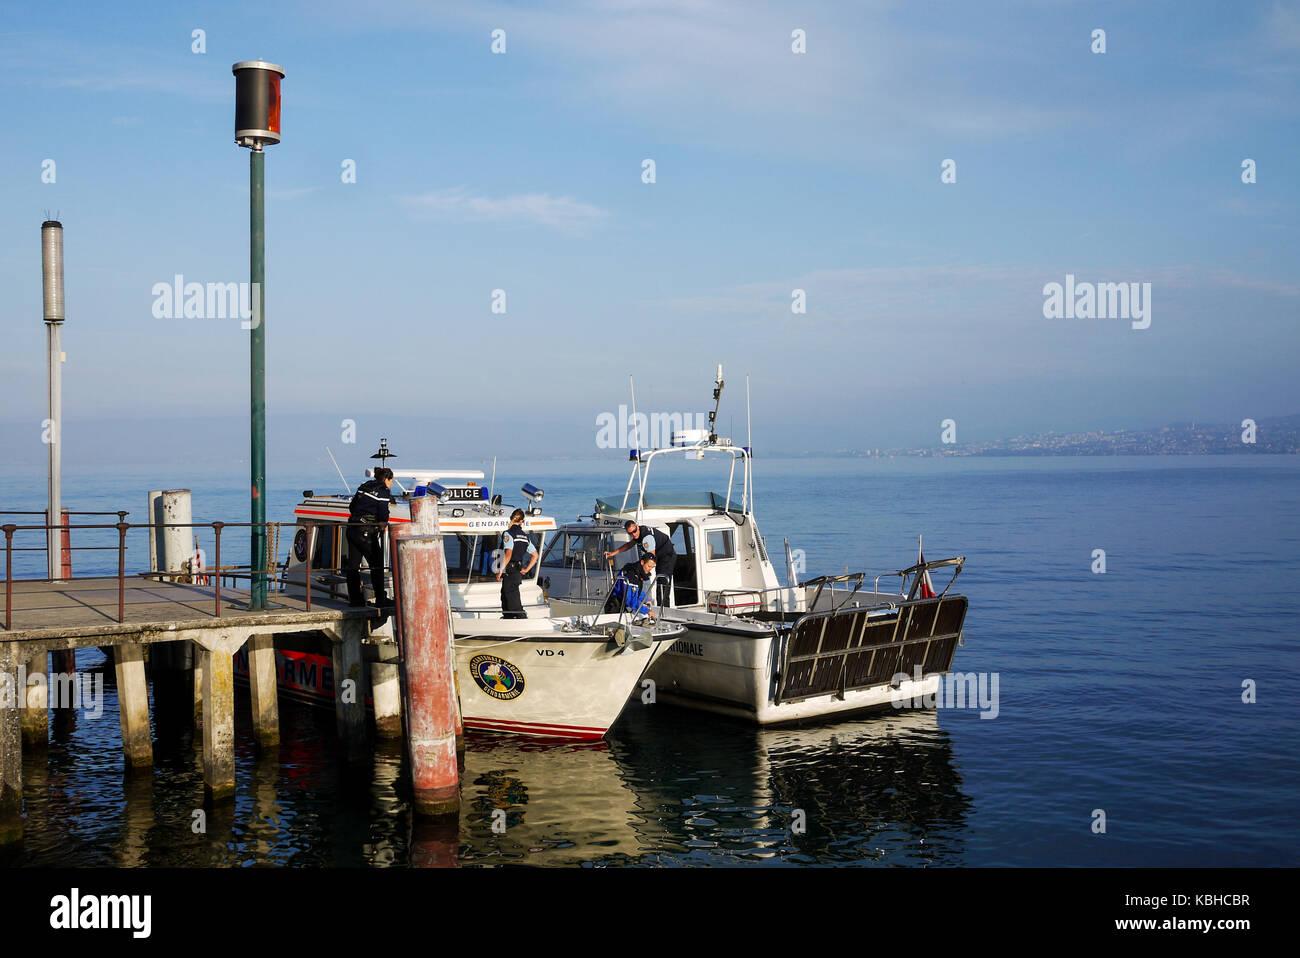 Swiss Gendarmerie boat on Leman Lake, Meillerie, France - Stock Image